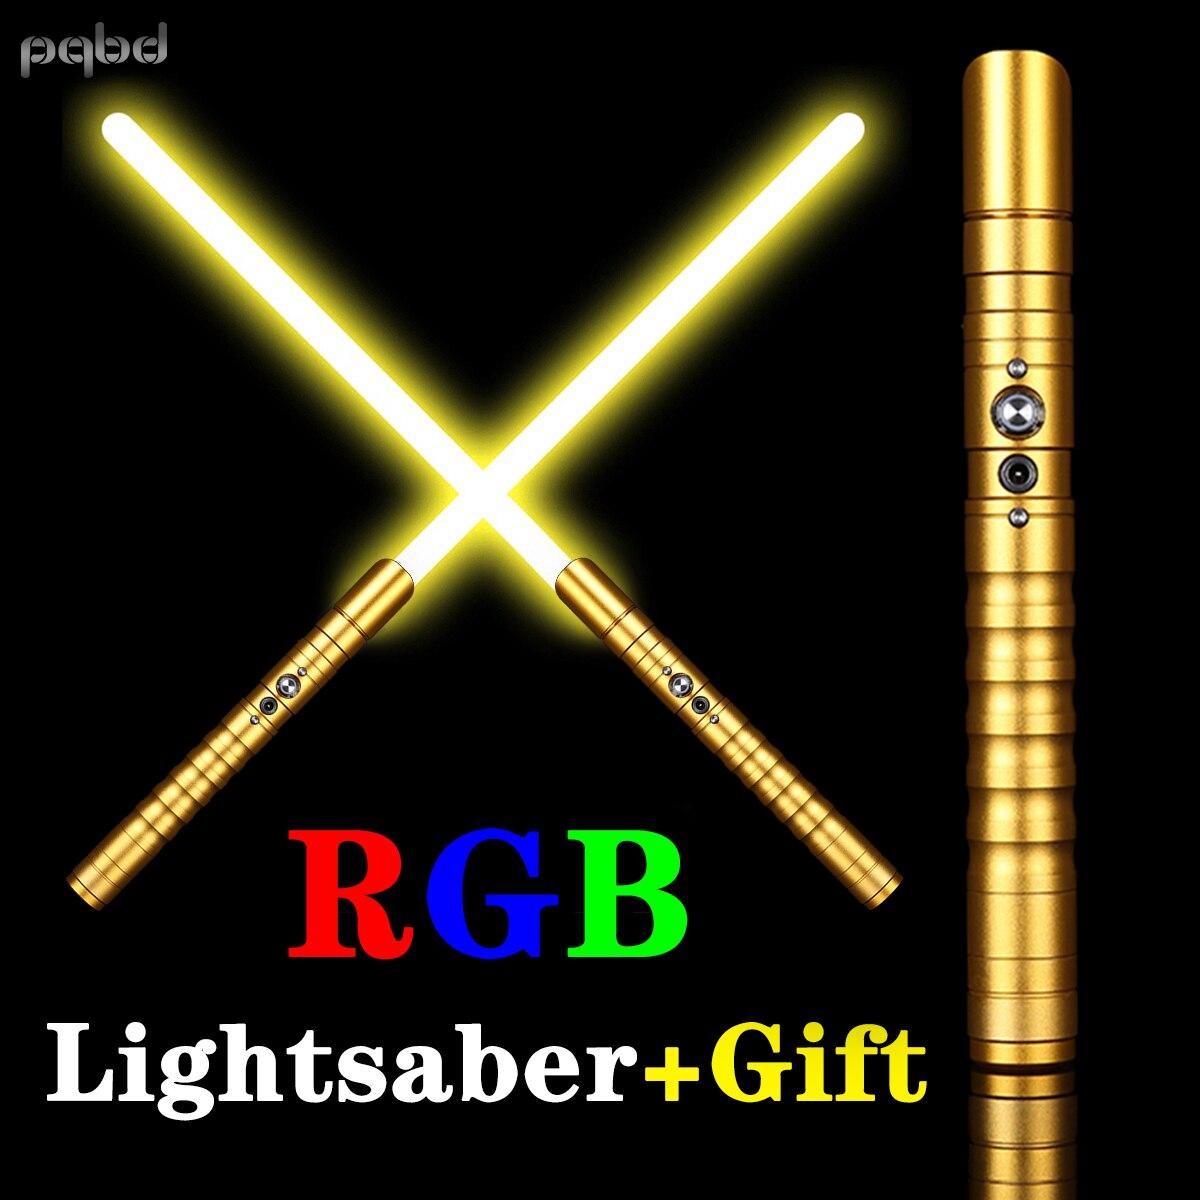 pqbd LED Saber Metal RGB Lightsaber with 3 Kinds of Sounds Heavy DuelingCosplay Ultra Sword Flashlight Kids Toys